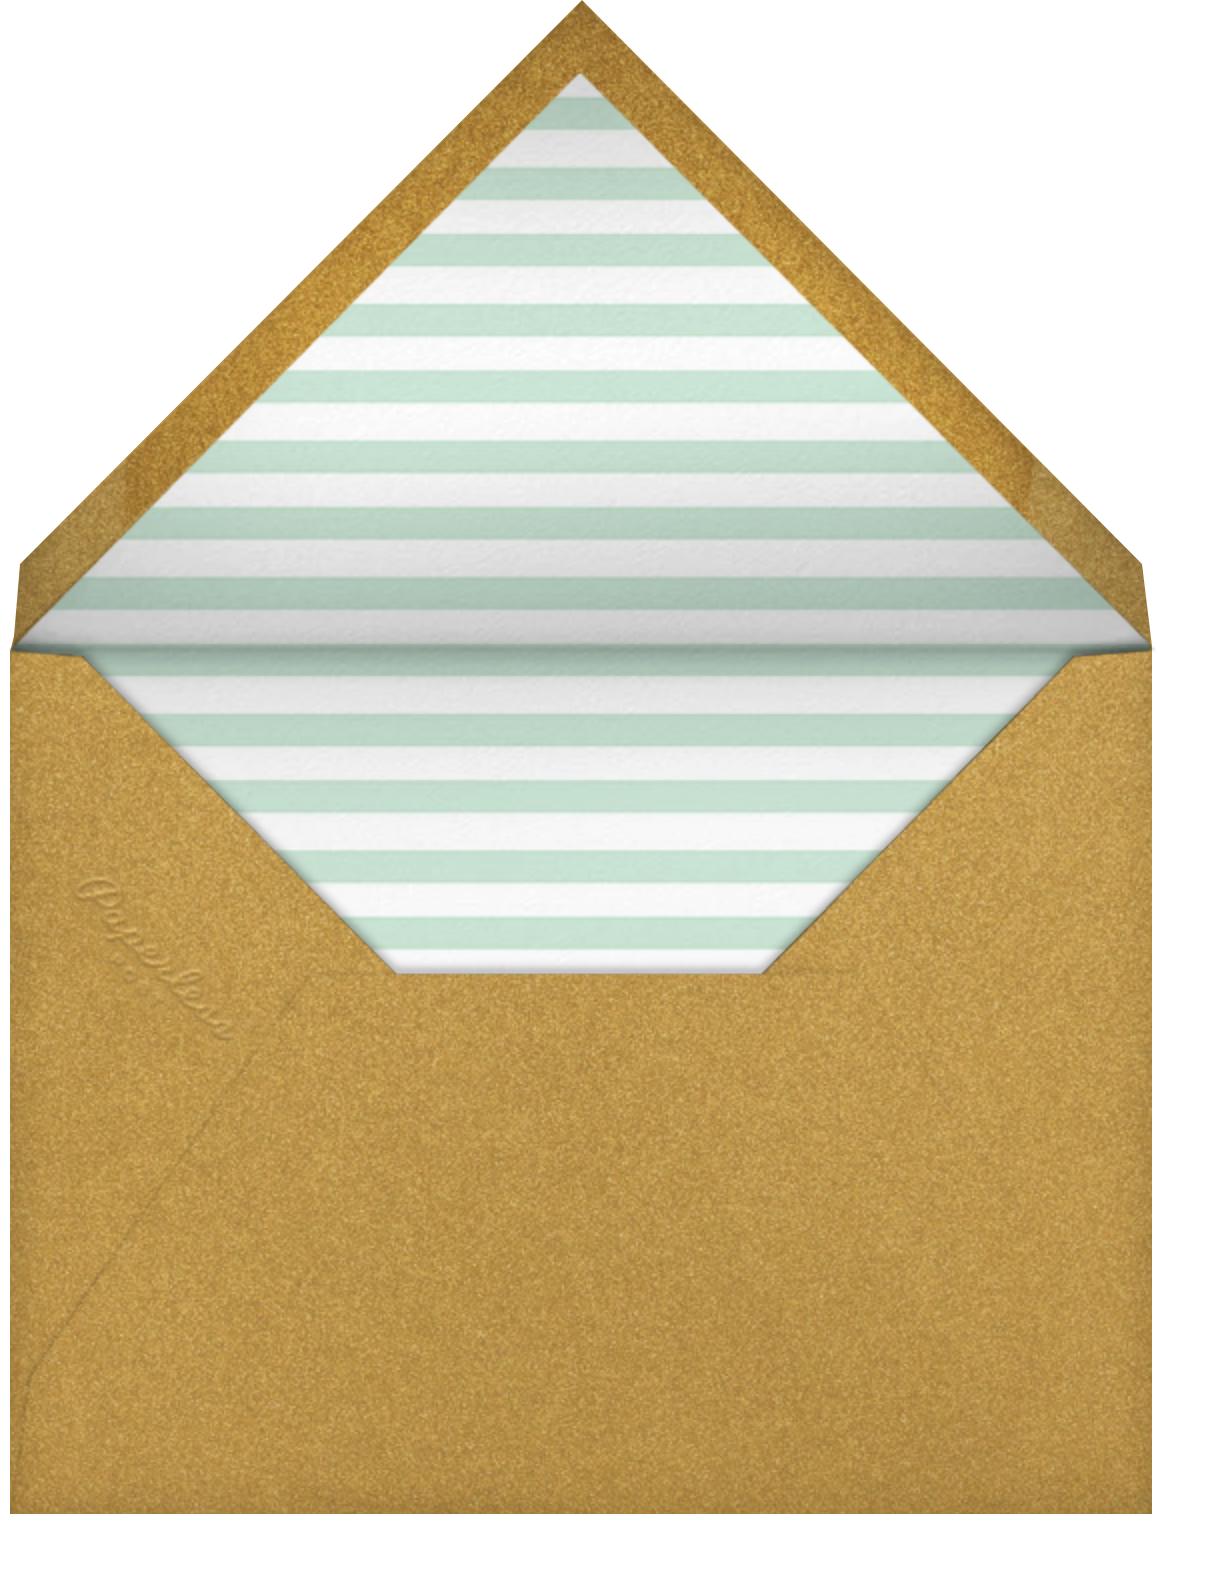 Critter Parade - Paperless Post - Envelope